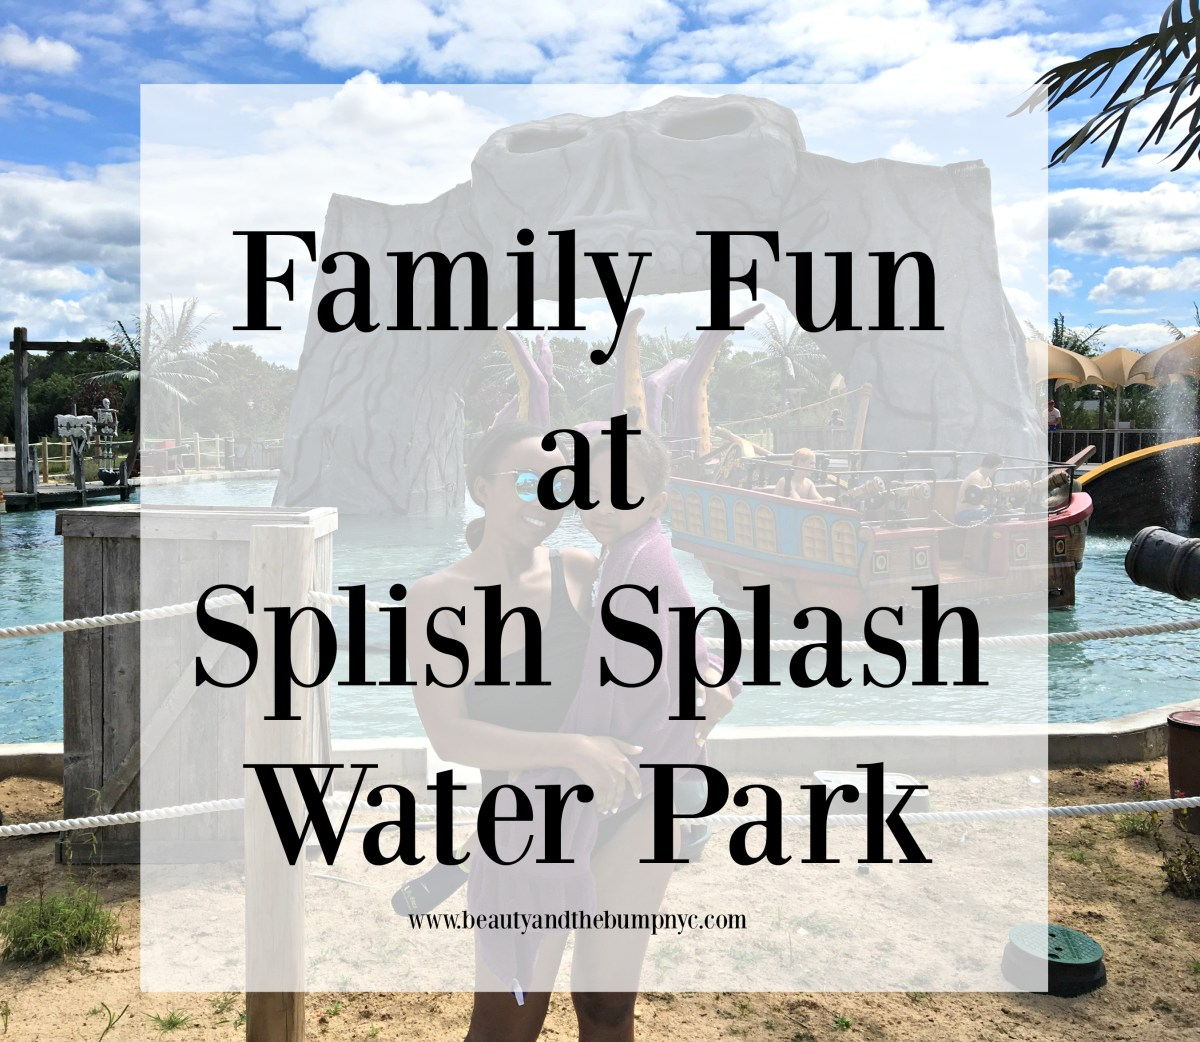 Family Fun at Splish Splash Water Park